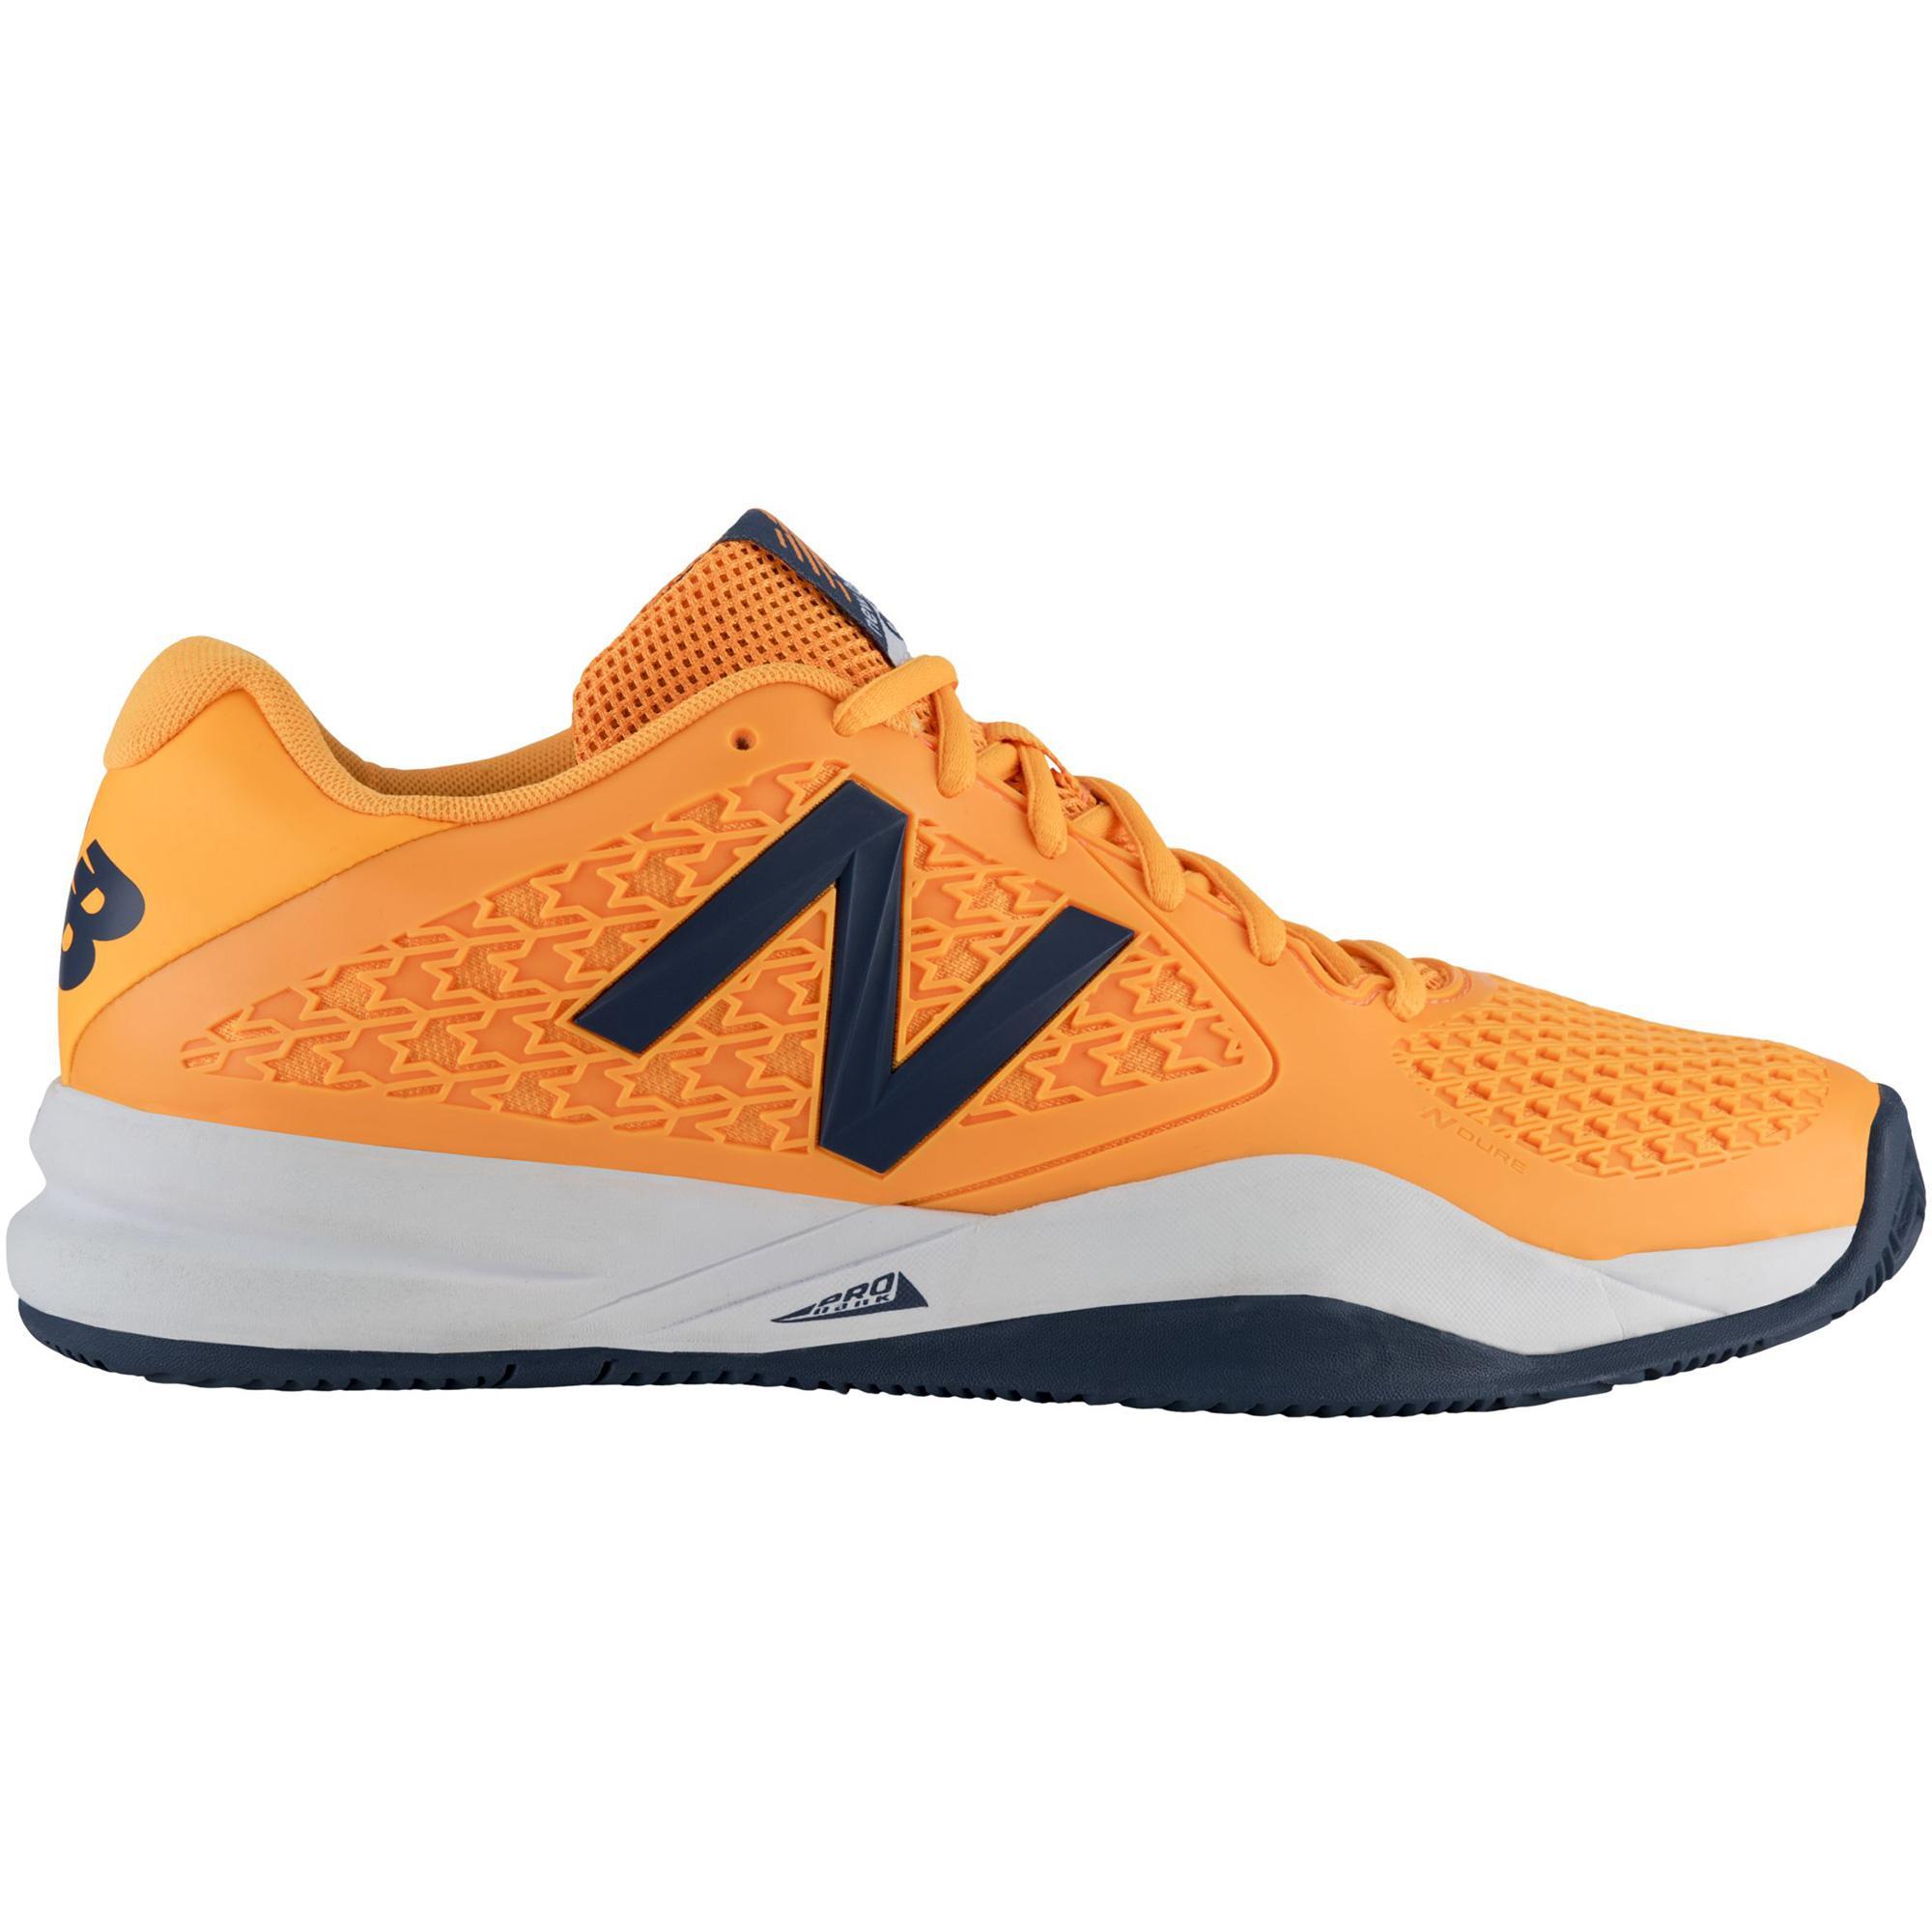 New Balance Us Open Tennis Shoes